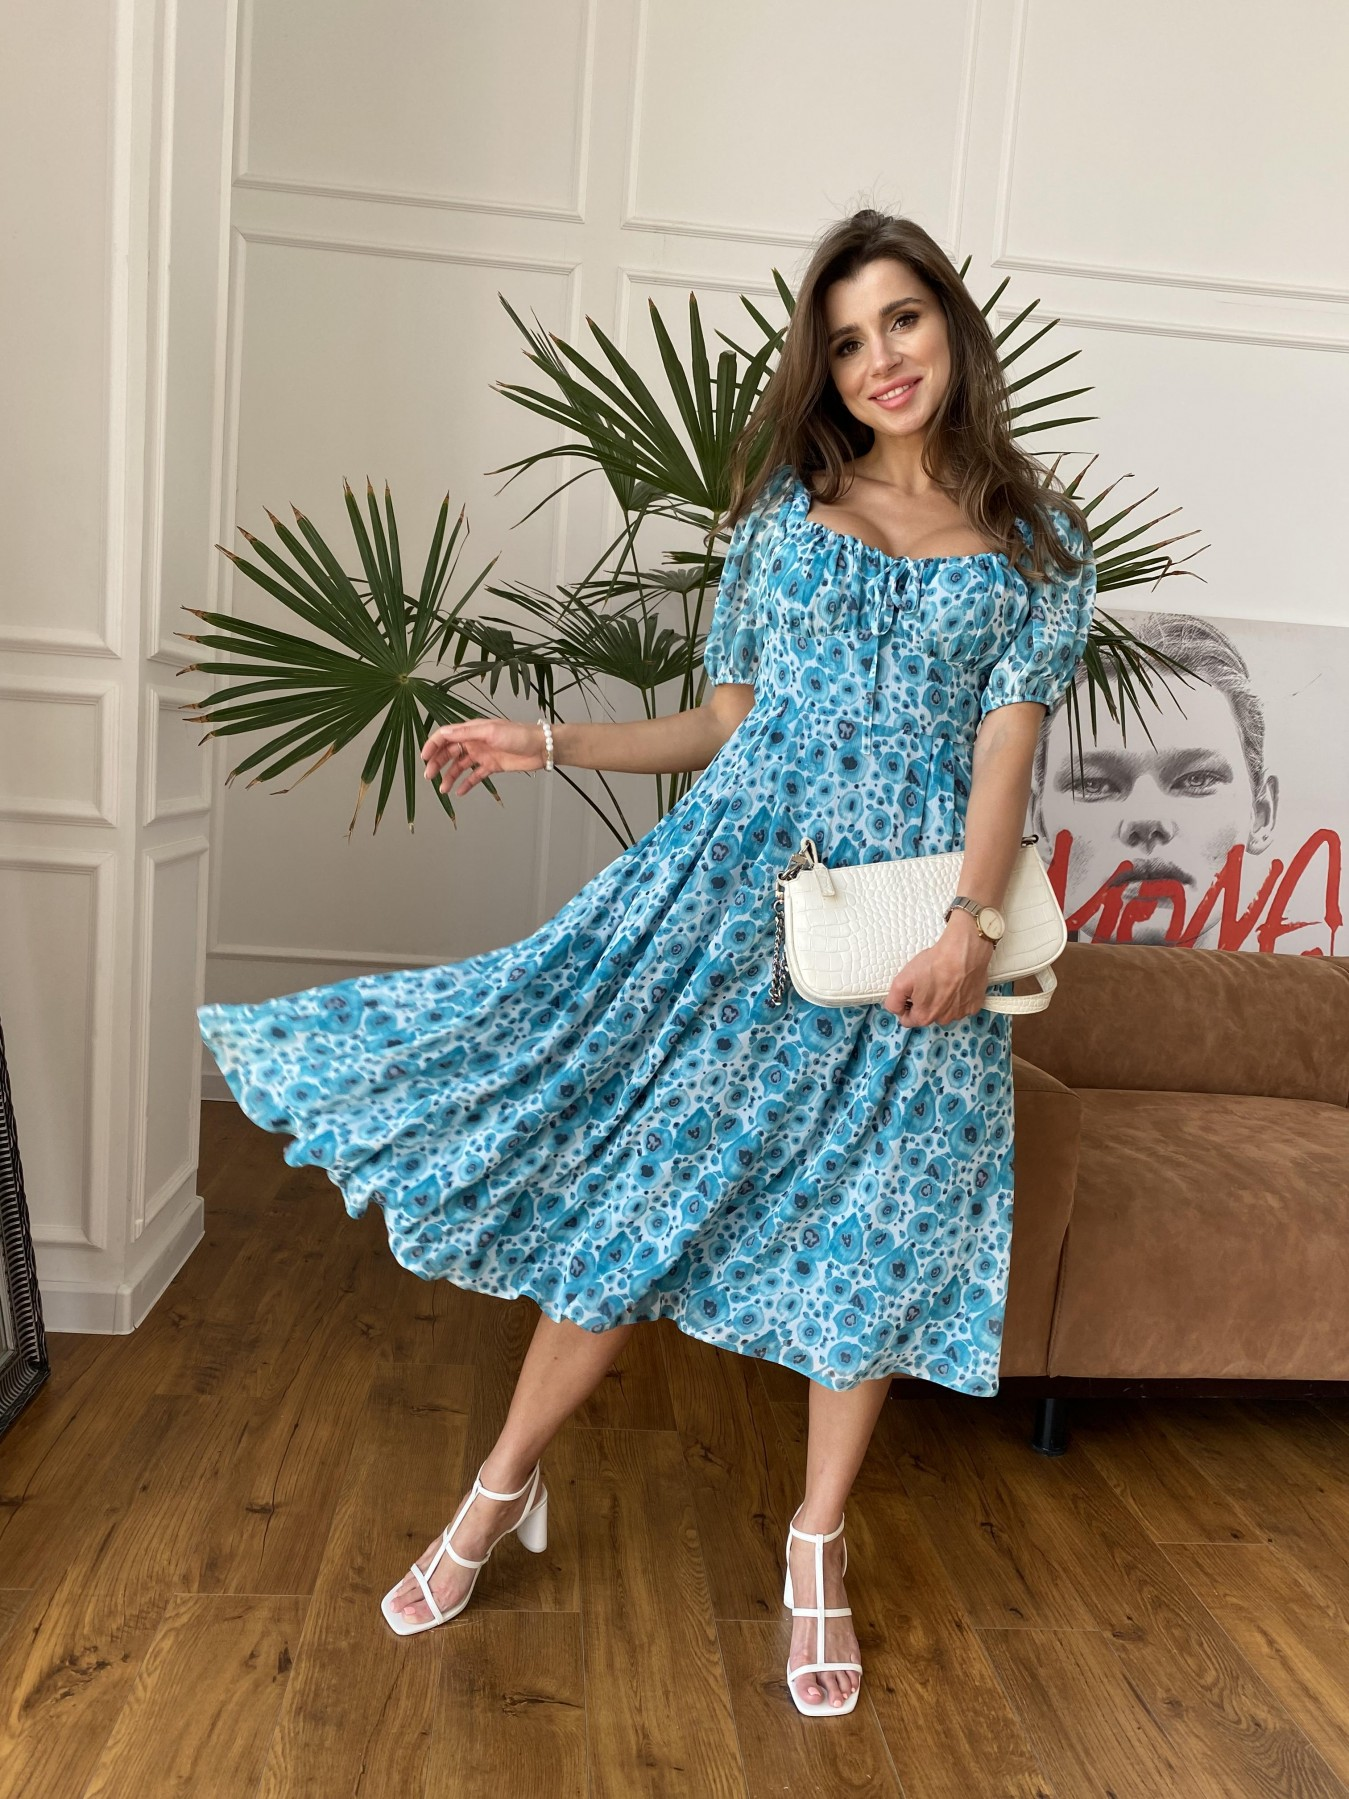 Кисес Миди платье из креп шифона в принт 11575 АРТ. 48269 Цвет: Маки/ Бирюза - фото 2, интернет магазин tm-modus.ru